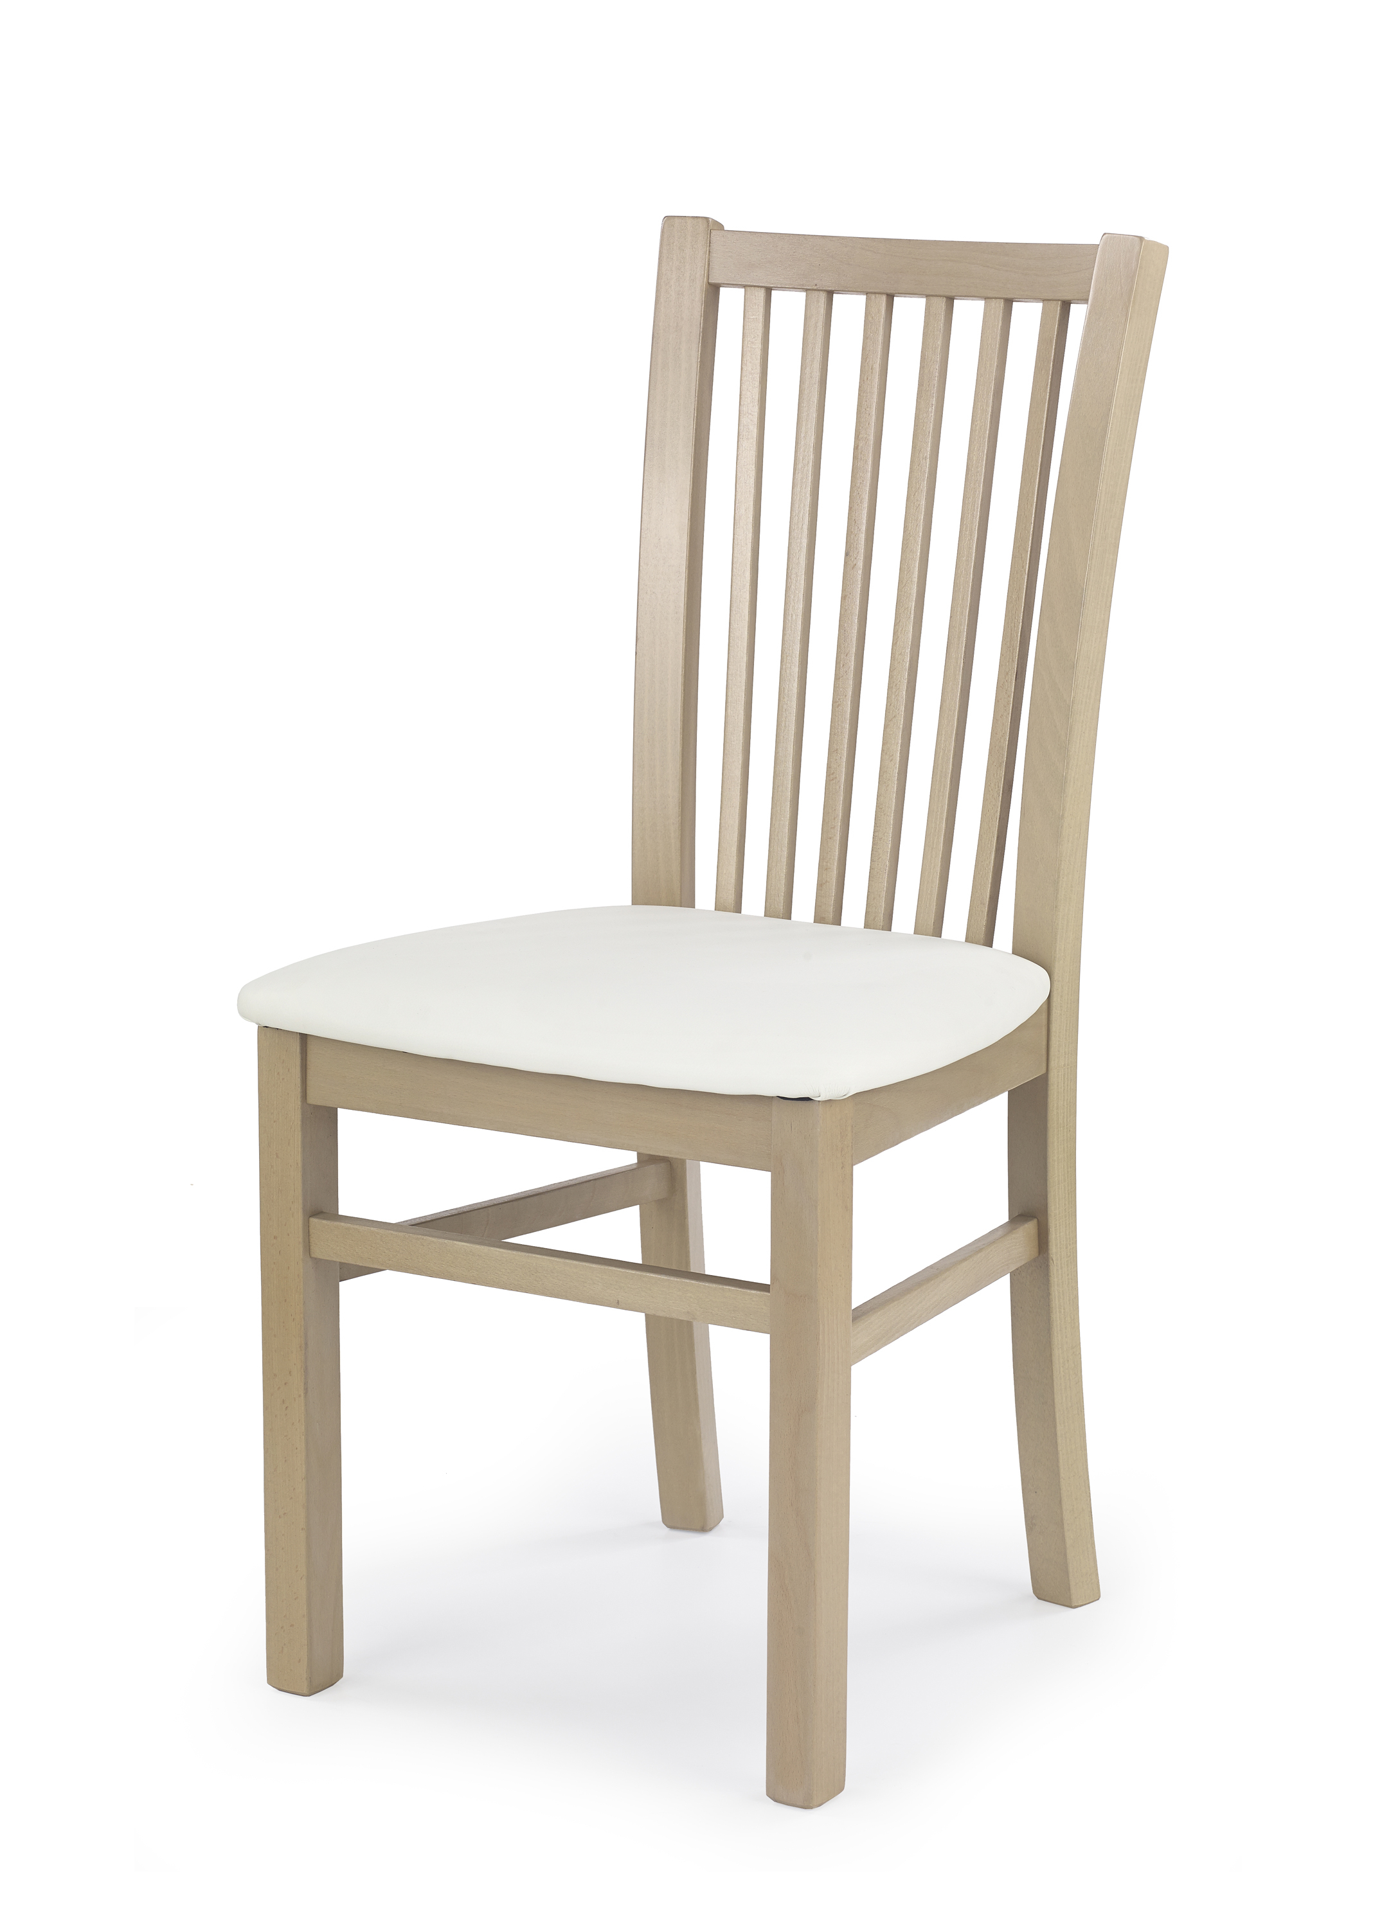 JACEK krzesło dąb sonoma / tap: MADRYT 121 (1p=2szt)